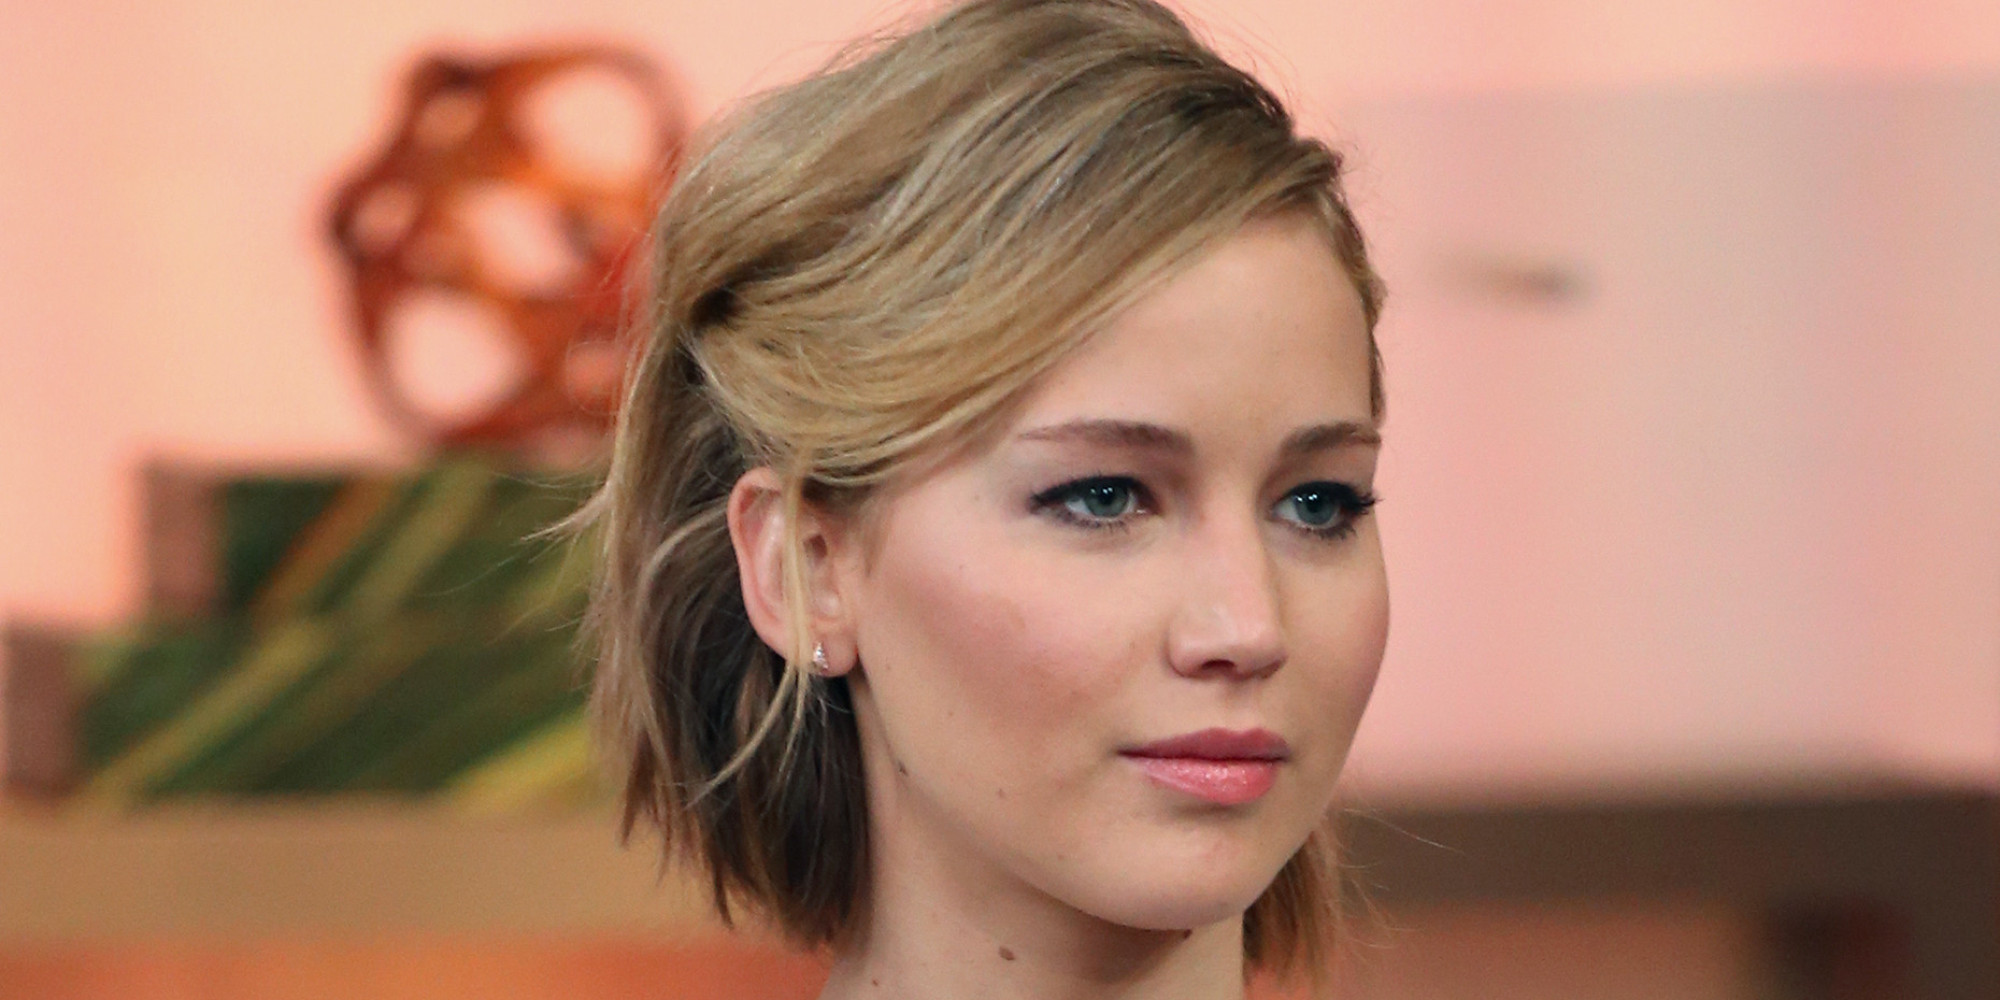 Jennifer Lawrence Wallpapers HD Download 2000x1000